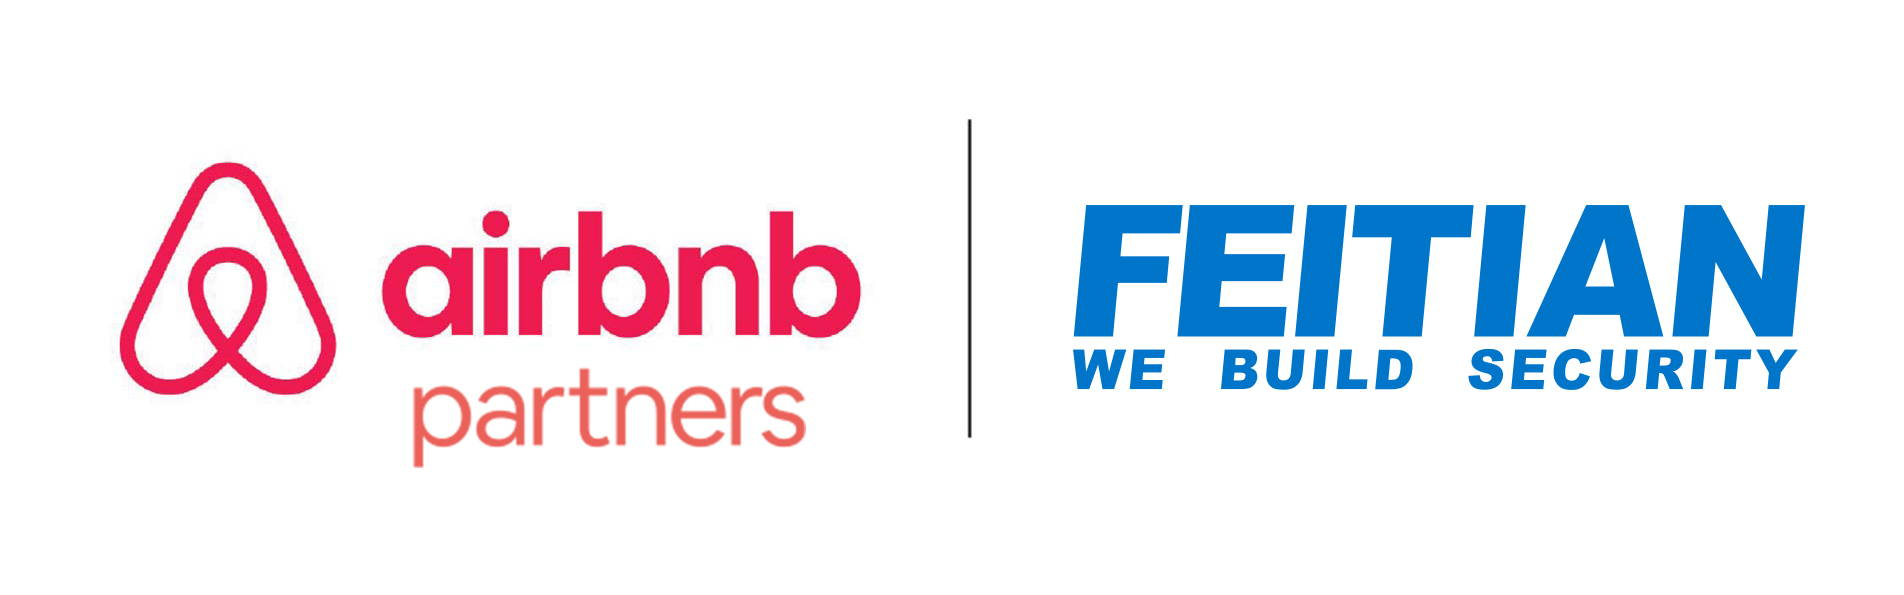 FEITIAN Airbnb Partner Portal